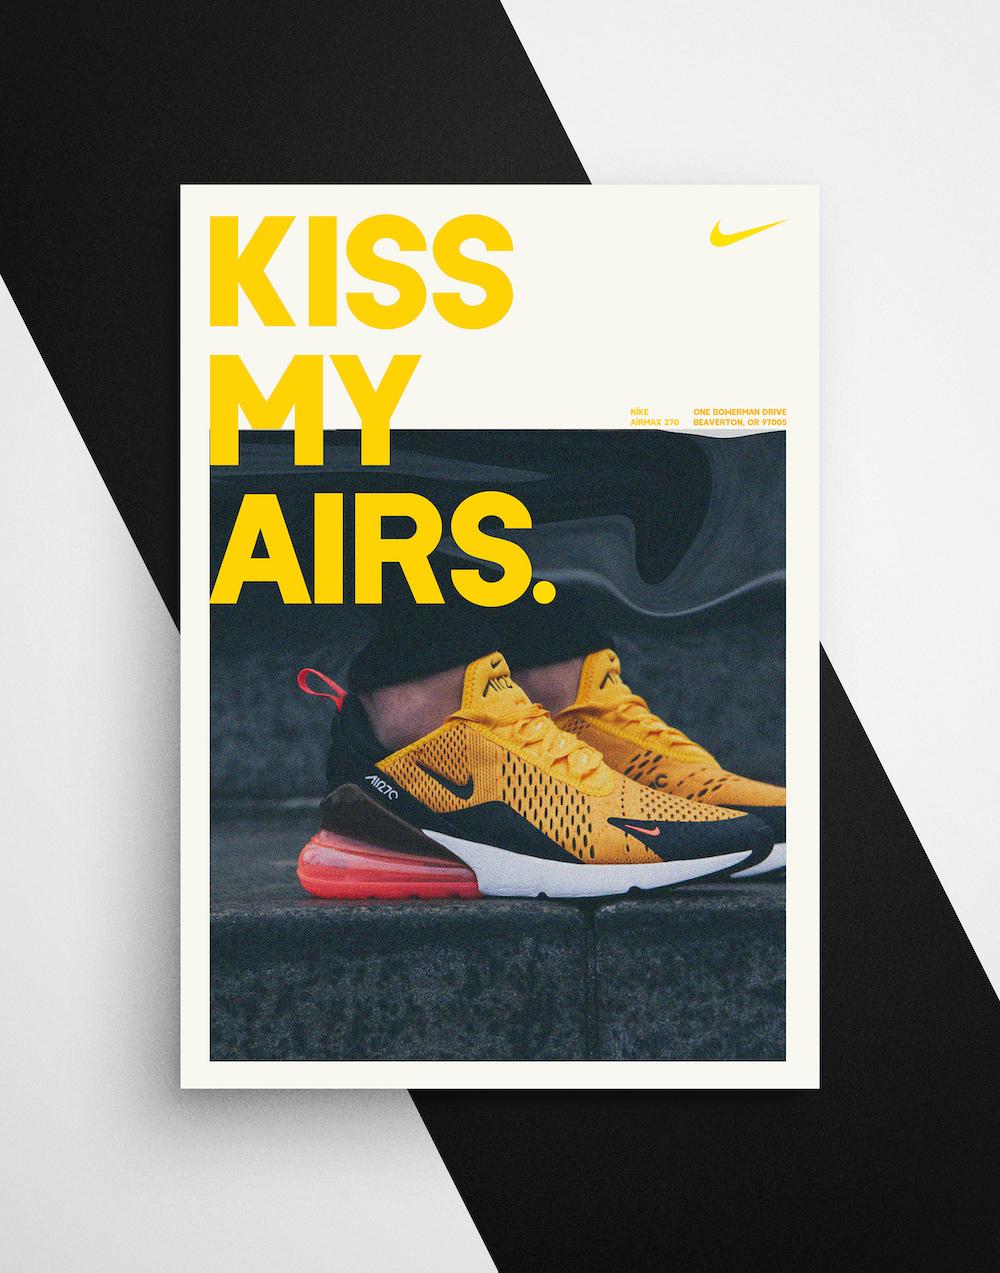 Modern Nike Sneaker Product Flyer Template2